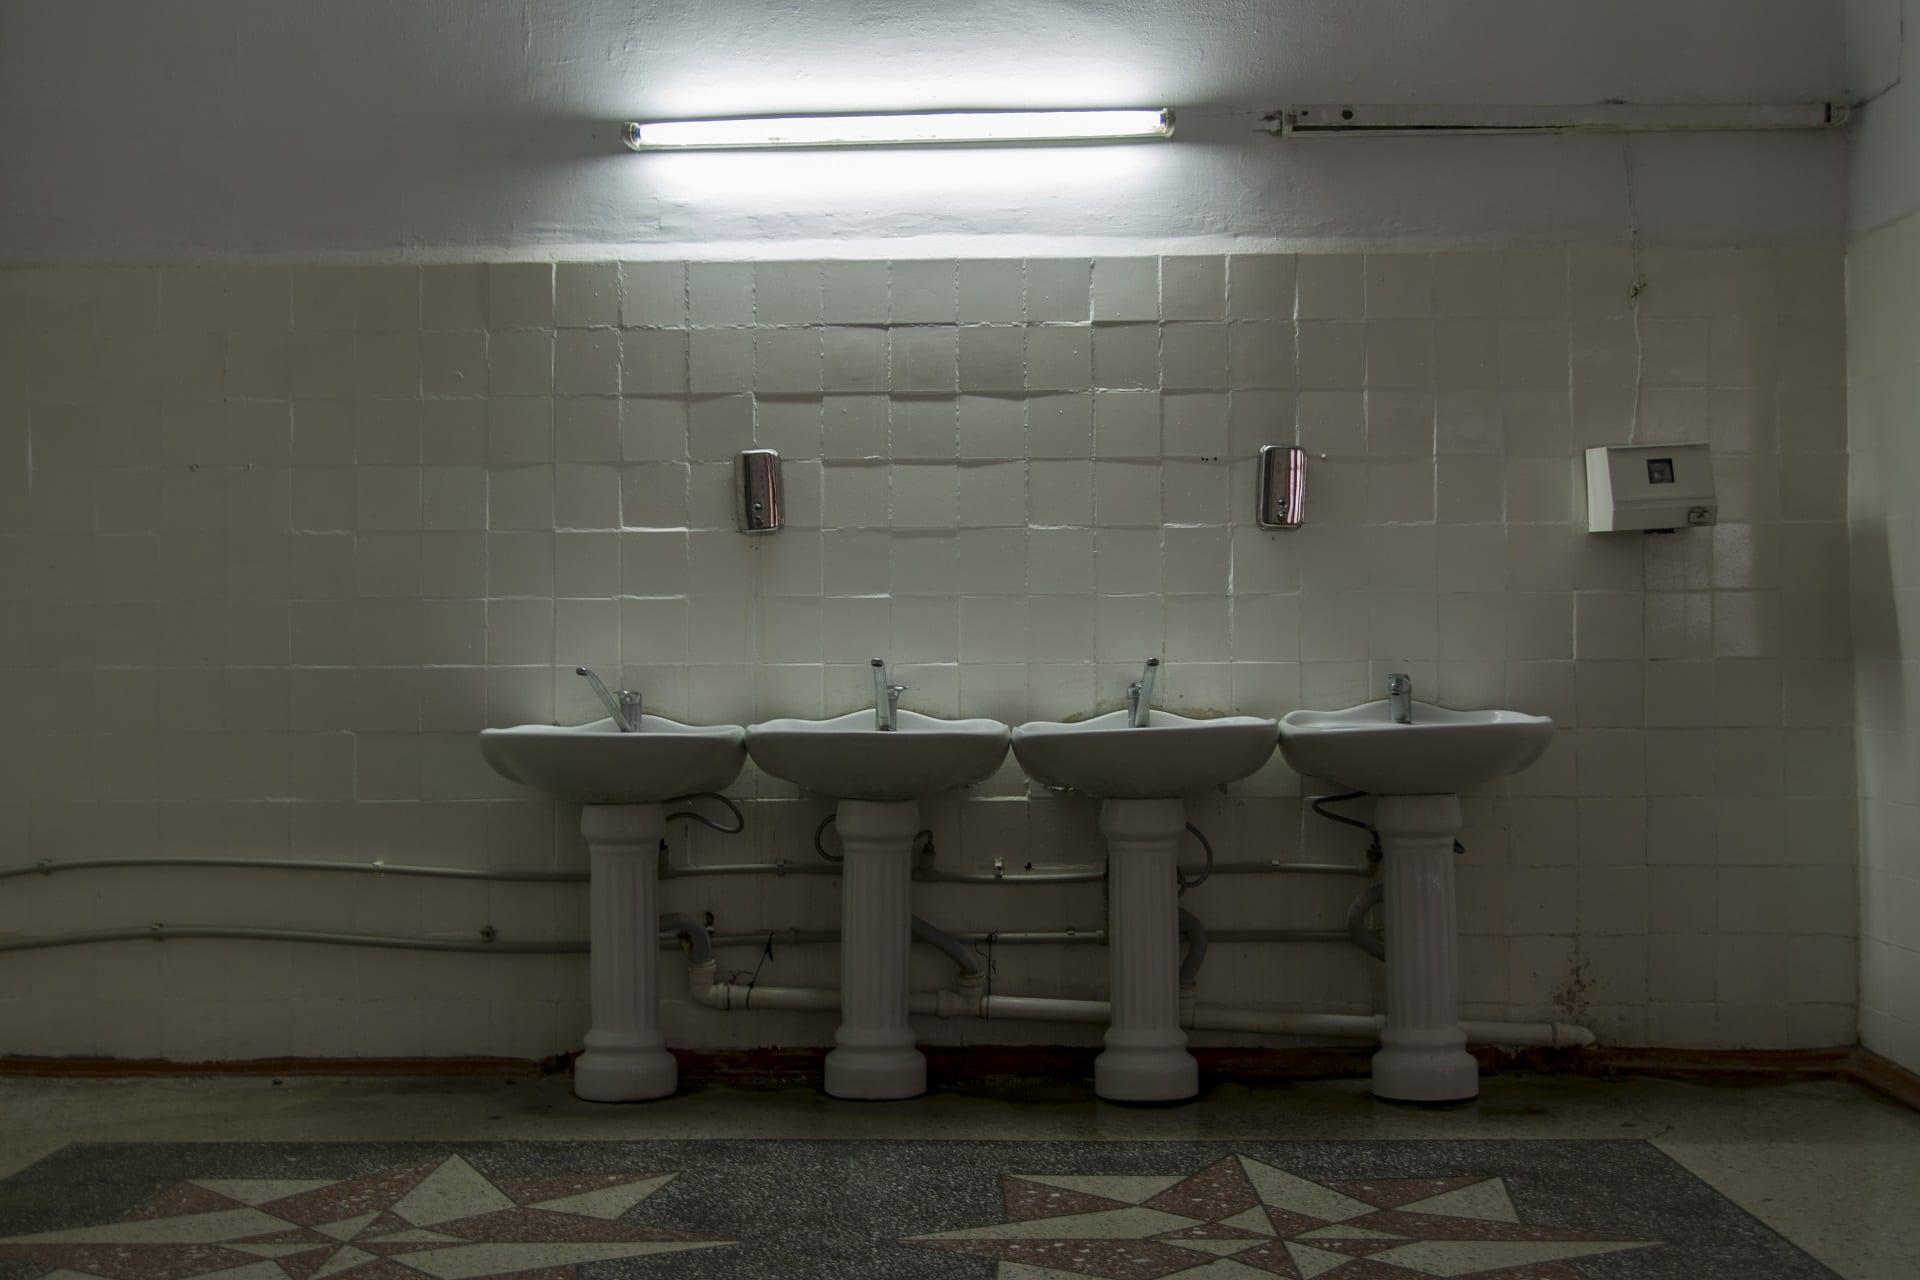 sanatorium, Dushanbe, Tajikistan